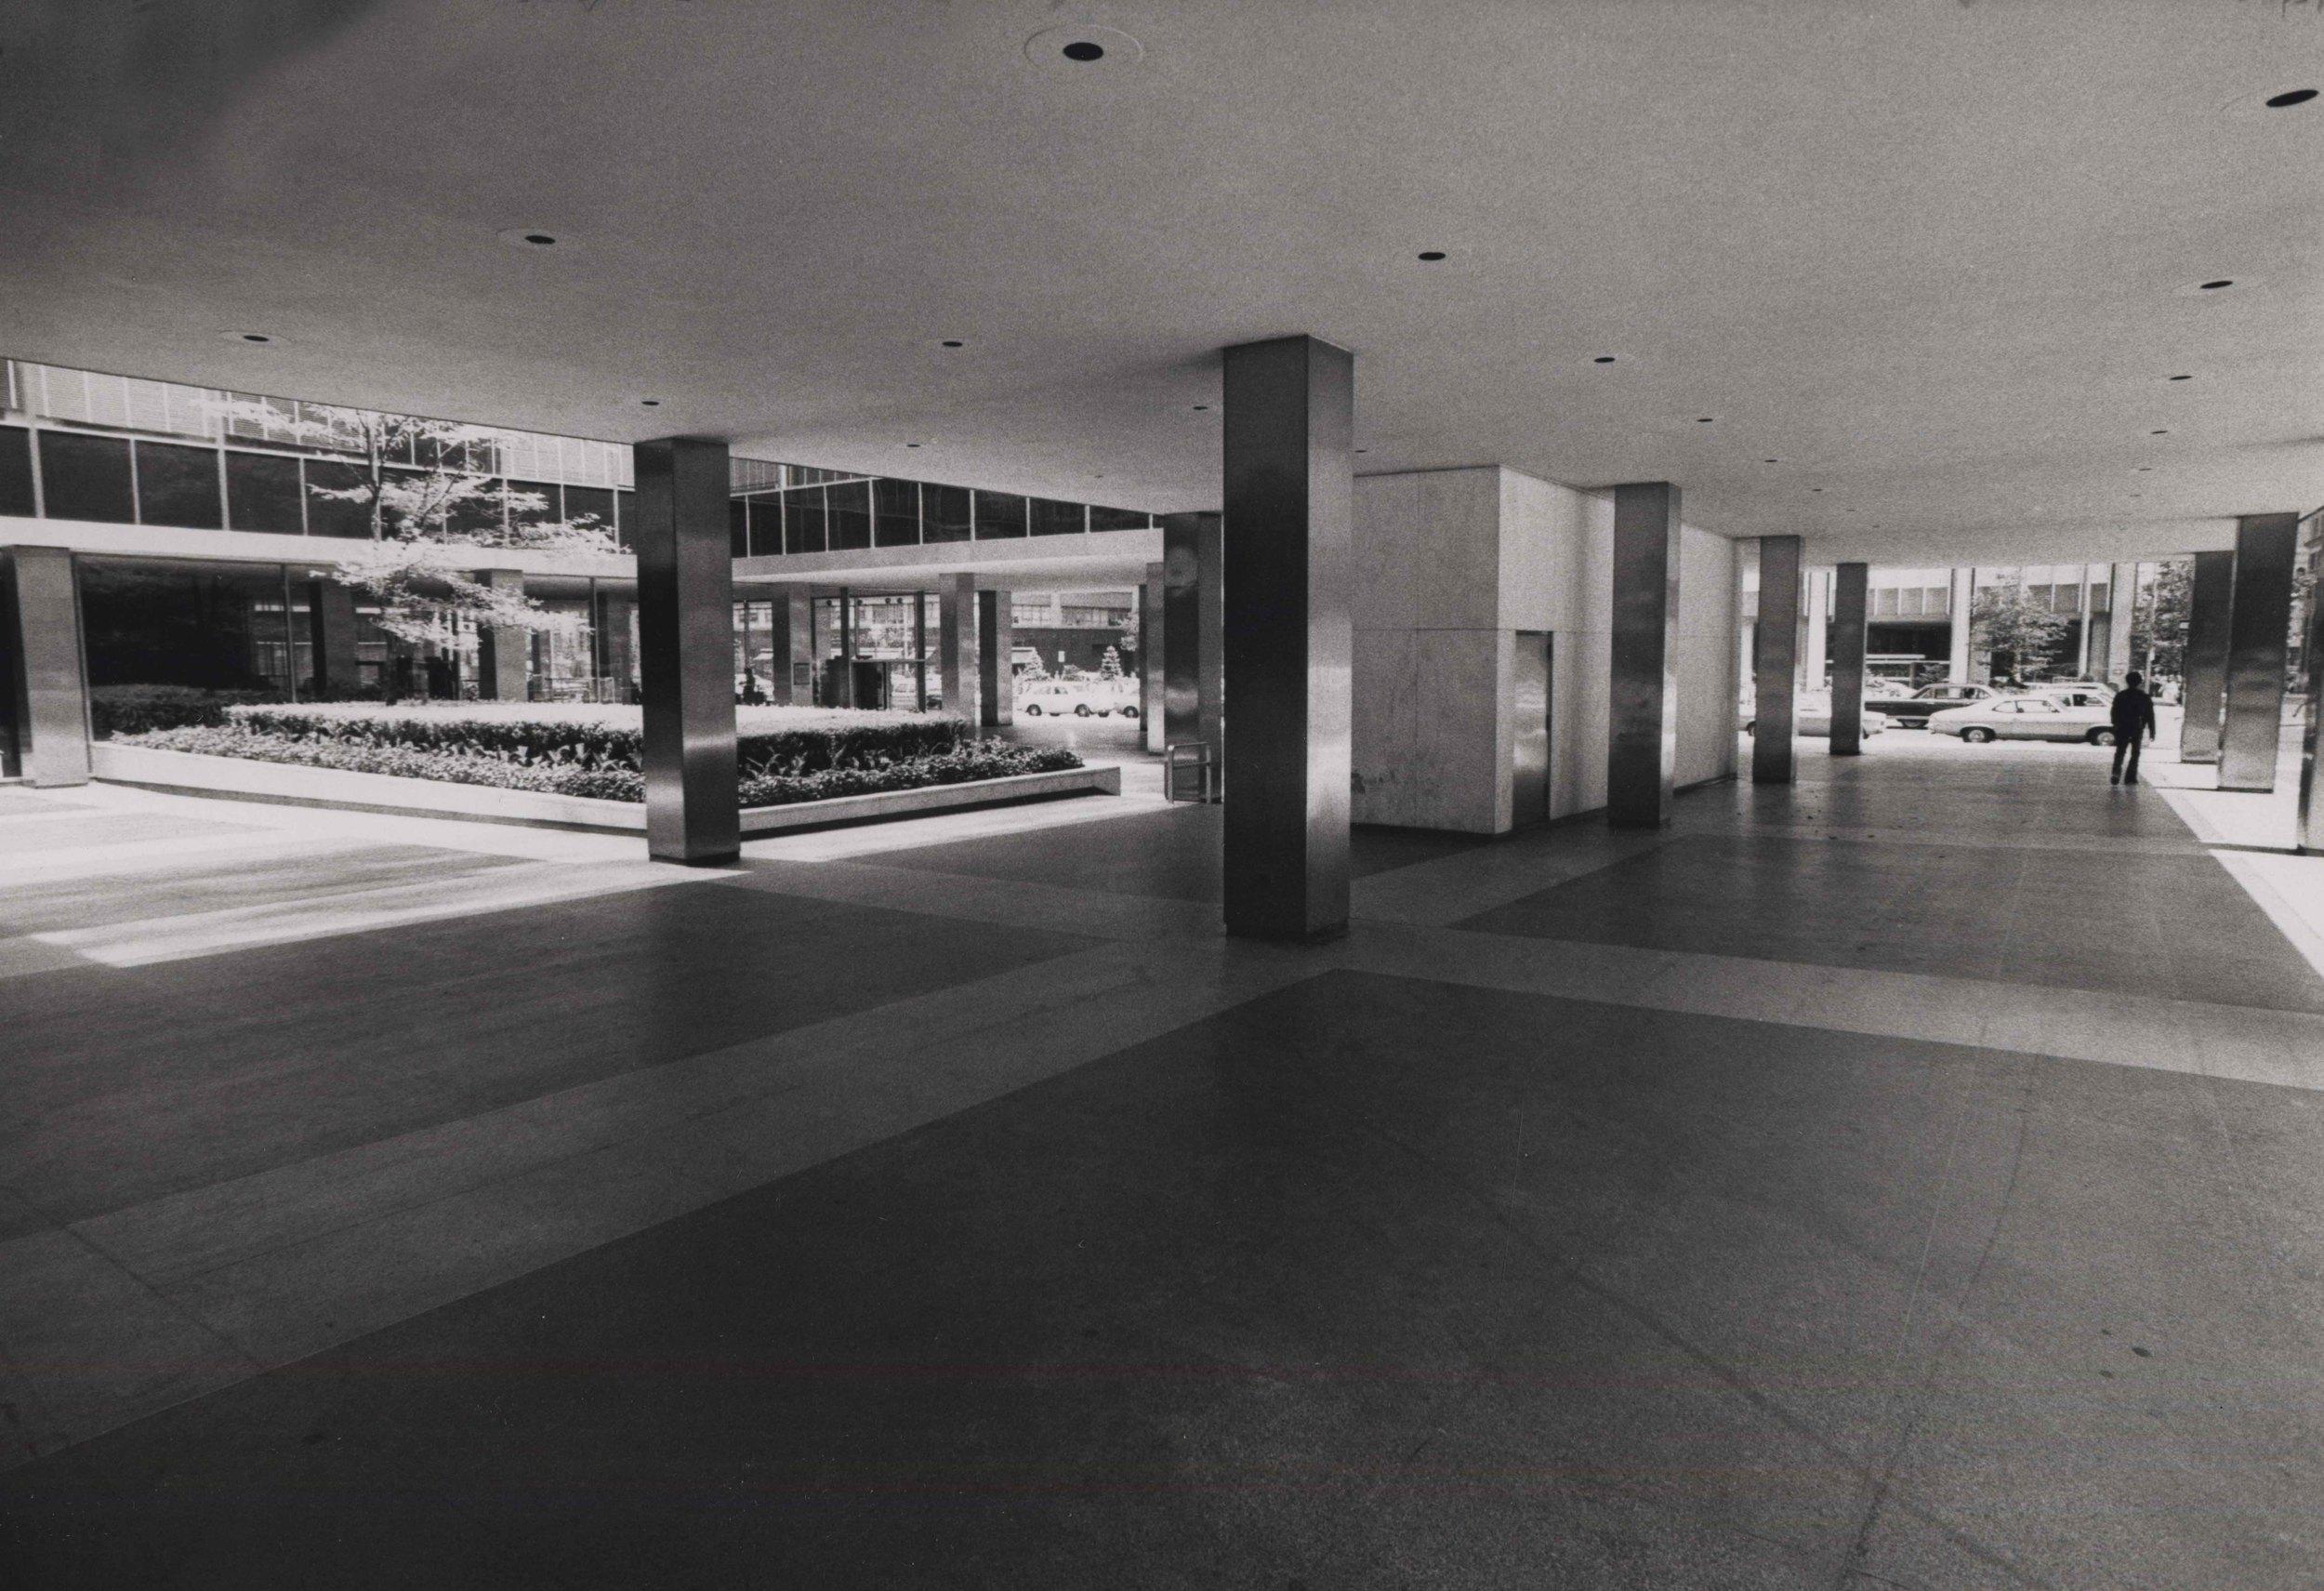 15_97_columns of a building_Dan Wynn Archive.jpeg